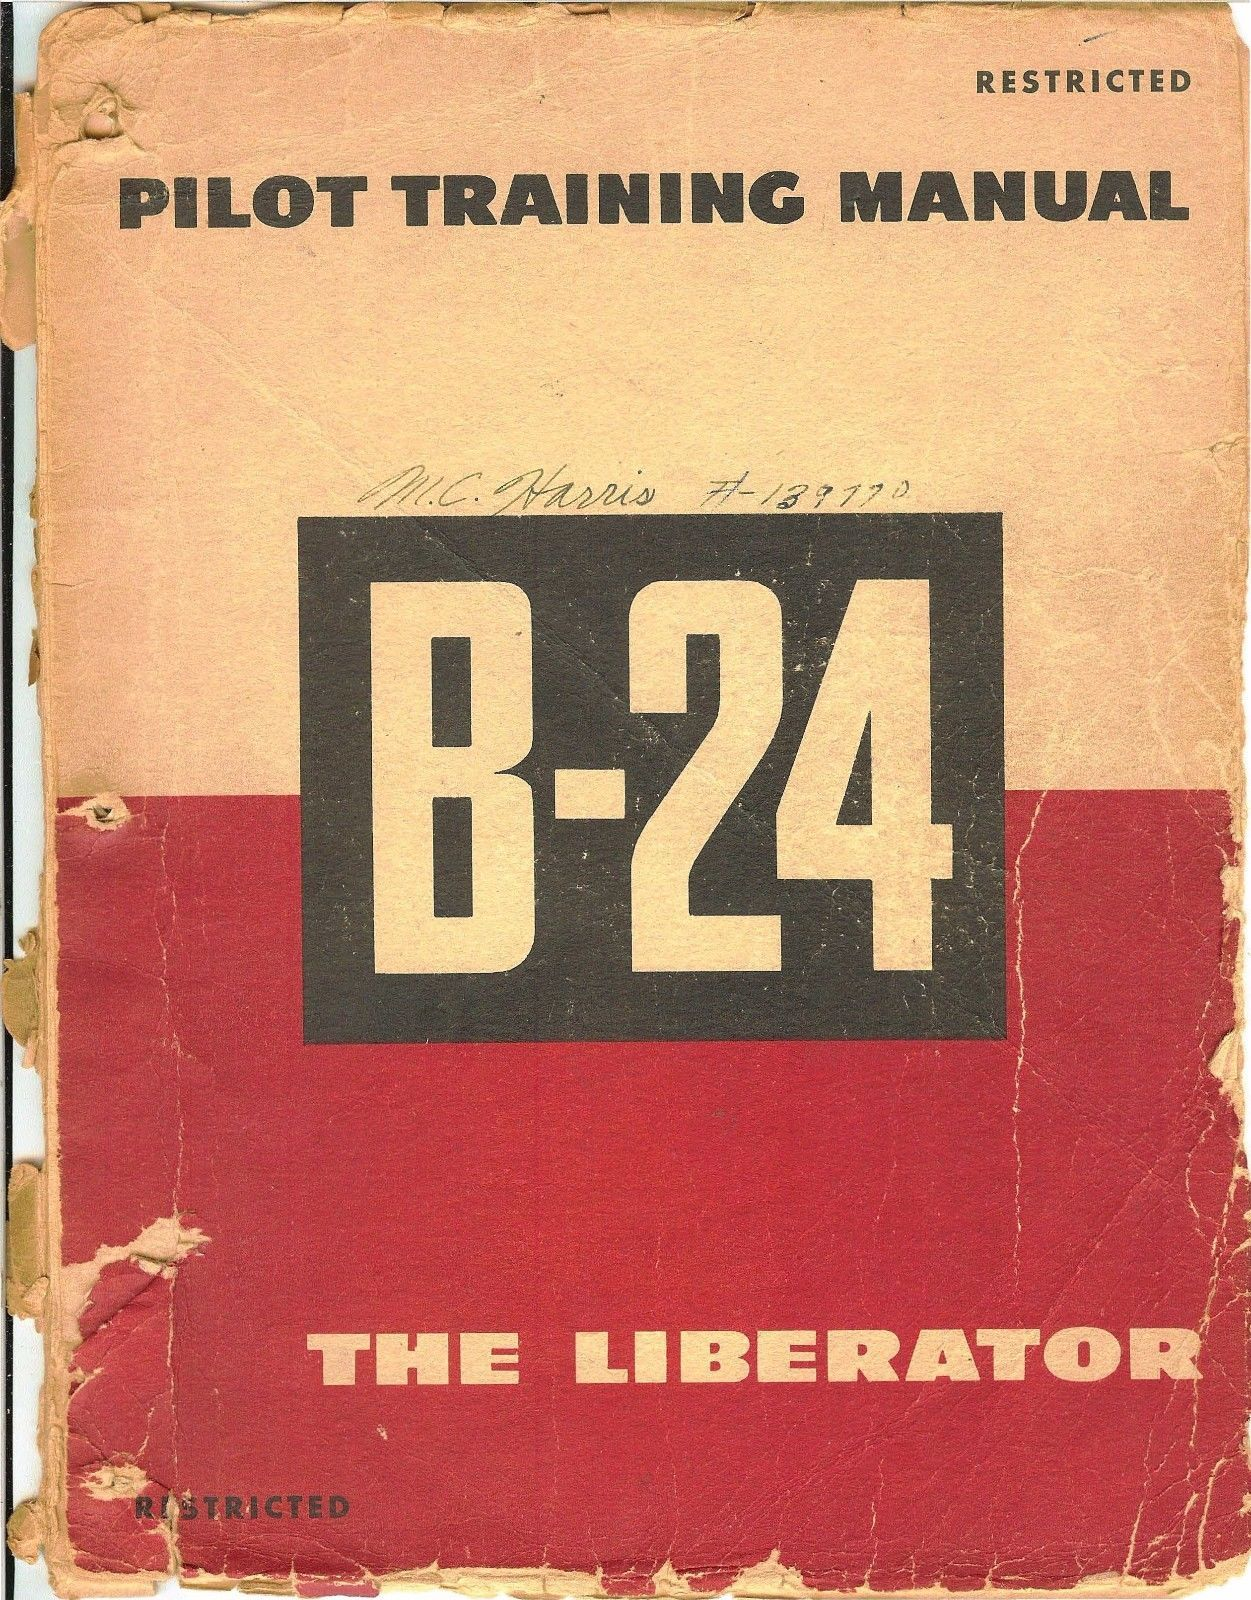 reprint wwii pilot training manual b 24 liberator 1944 military reprint wwii pilot training manual b 24 liberator 1944